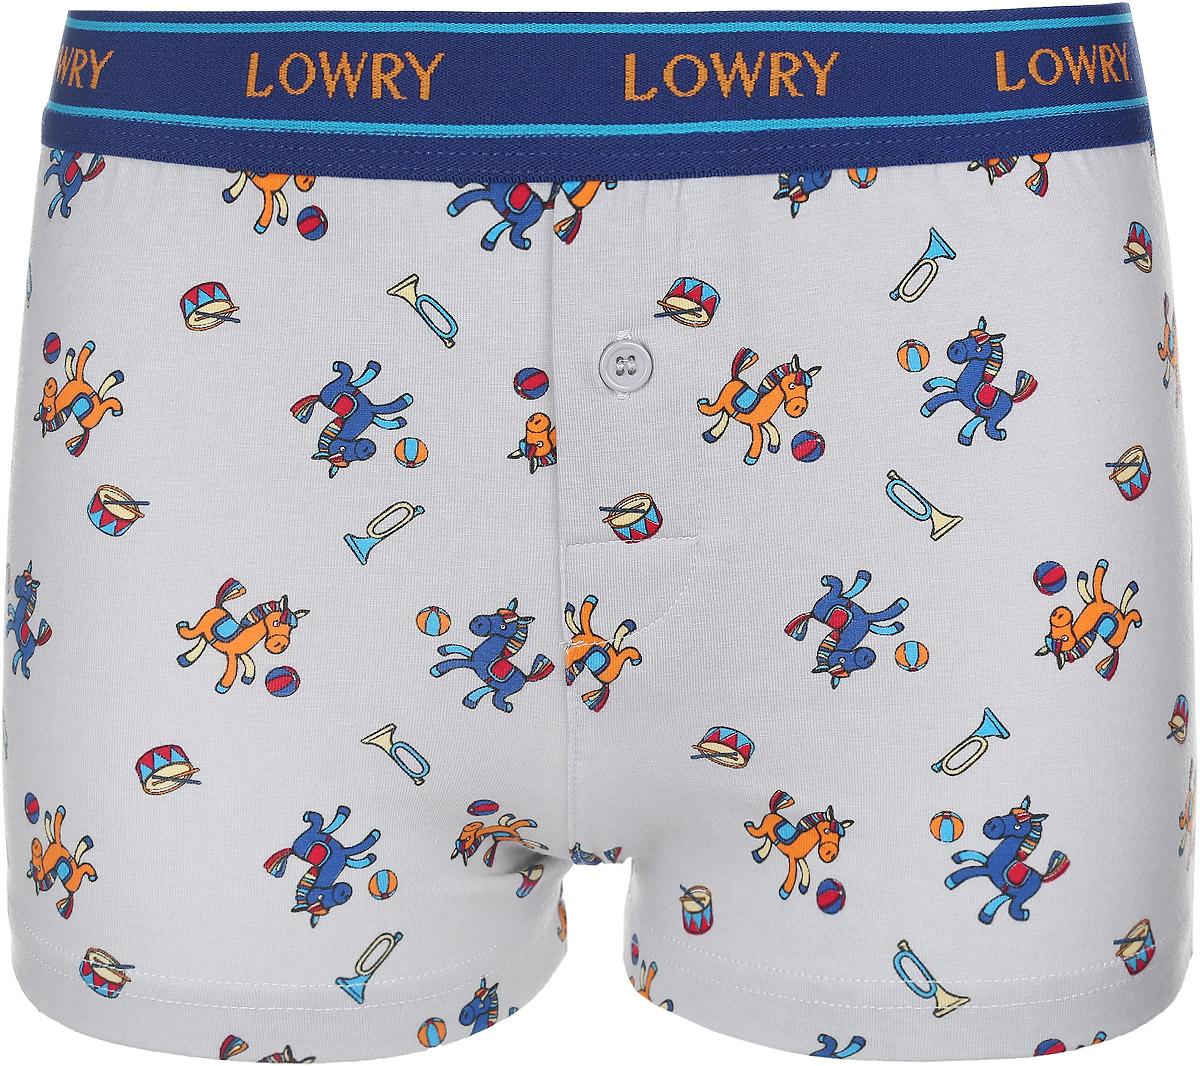 Lowry ����� �������� ��� ��������. BSHL-317